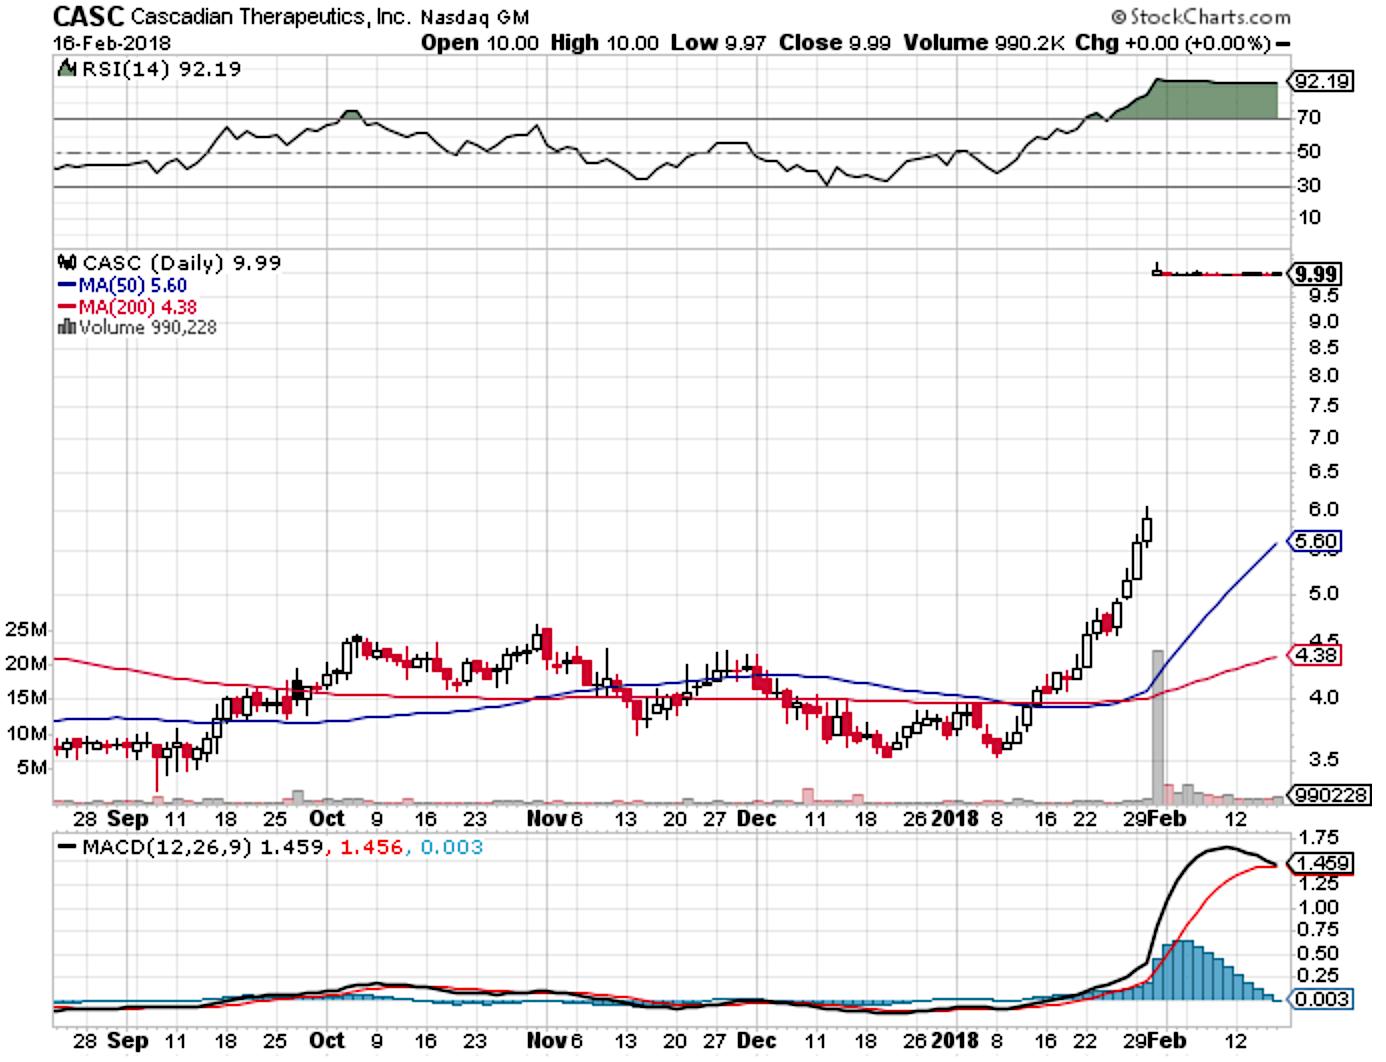 Celg celgene corporation crowdsourced stock ratings sauploadoiathdstsk9b5ygtoe5mz4zaujduieqhgkvhlanzvjxmemfbtc2x5jrlzbv1c4pijb5ysdlg3y9qr16mqshnnrys1qgww3a94crgmfltjddtunbmtdzcklb9wbvi 8e1ftubhbthumb1g biocorpaavc Images